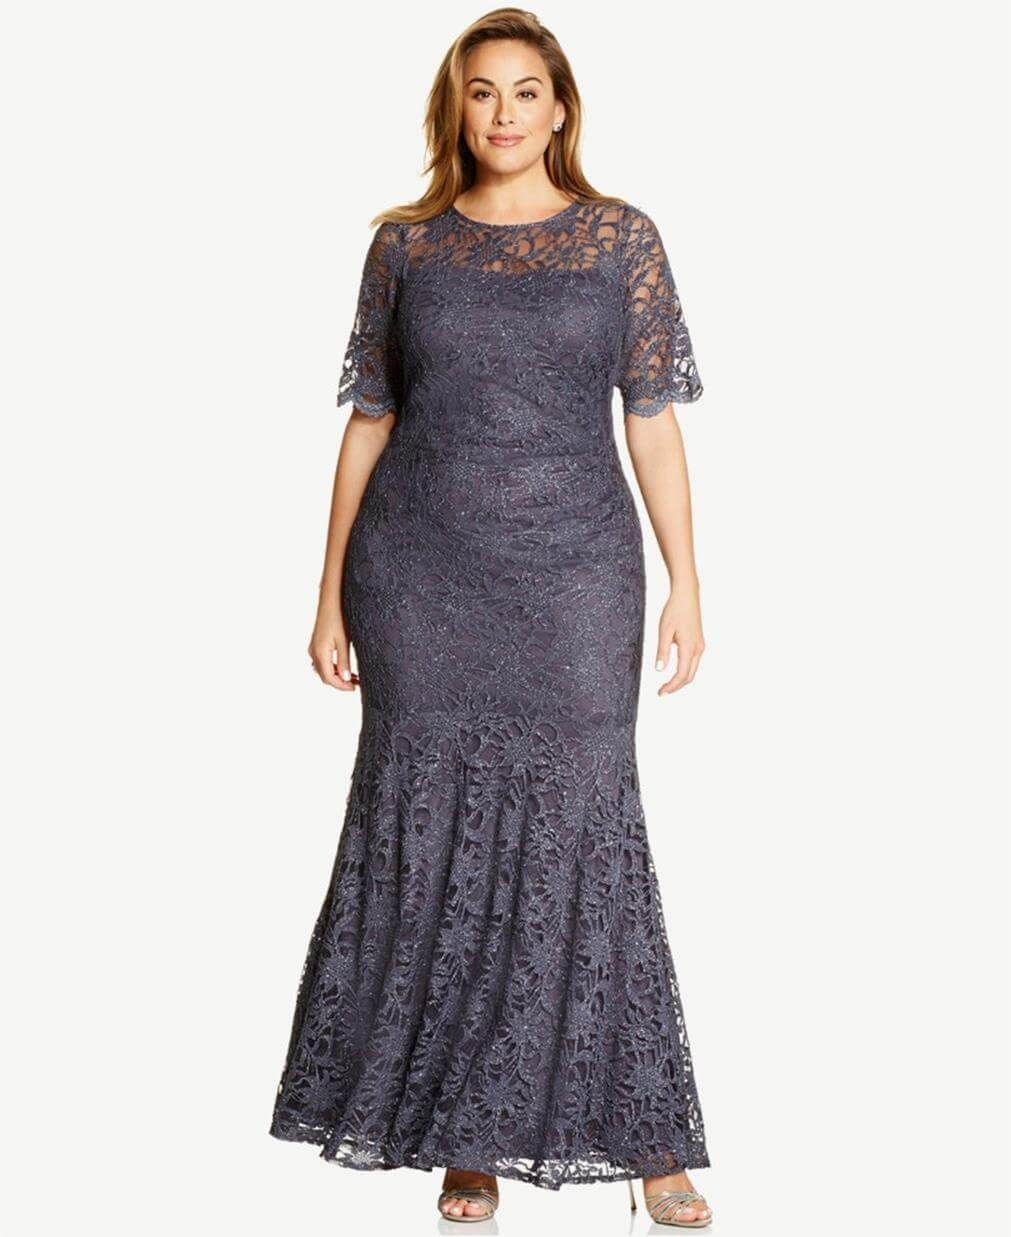 e0bc57963e8 30+ Beautiful Macys Dresses For Wedding Guests Ideas